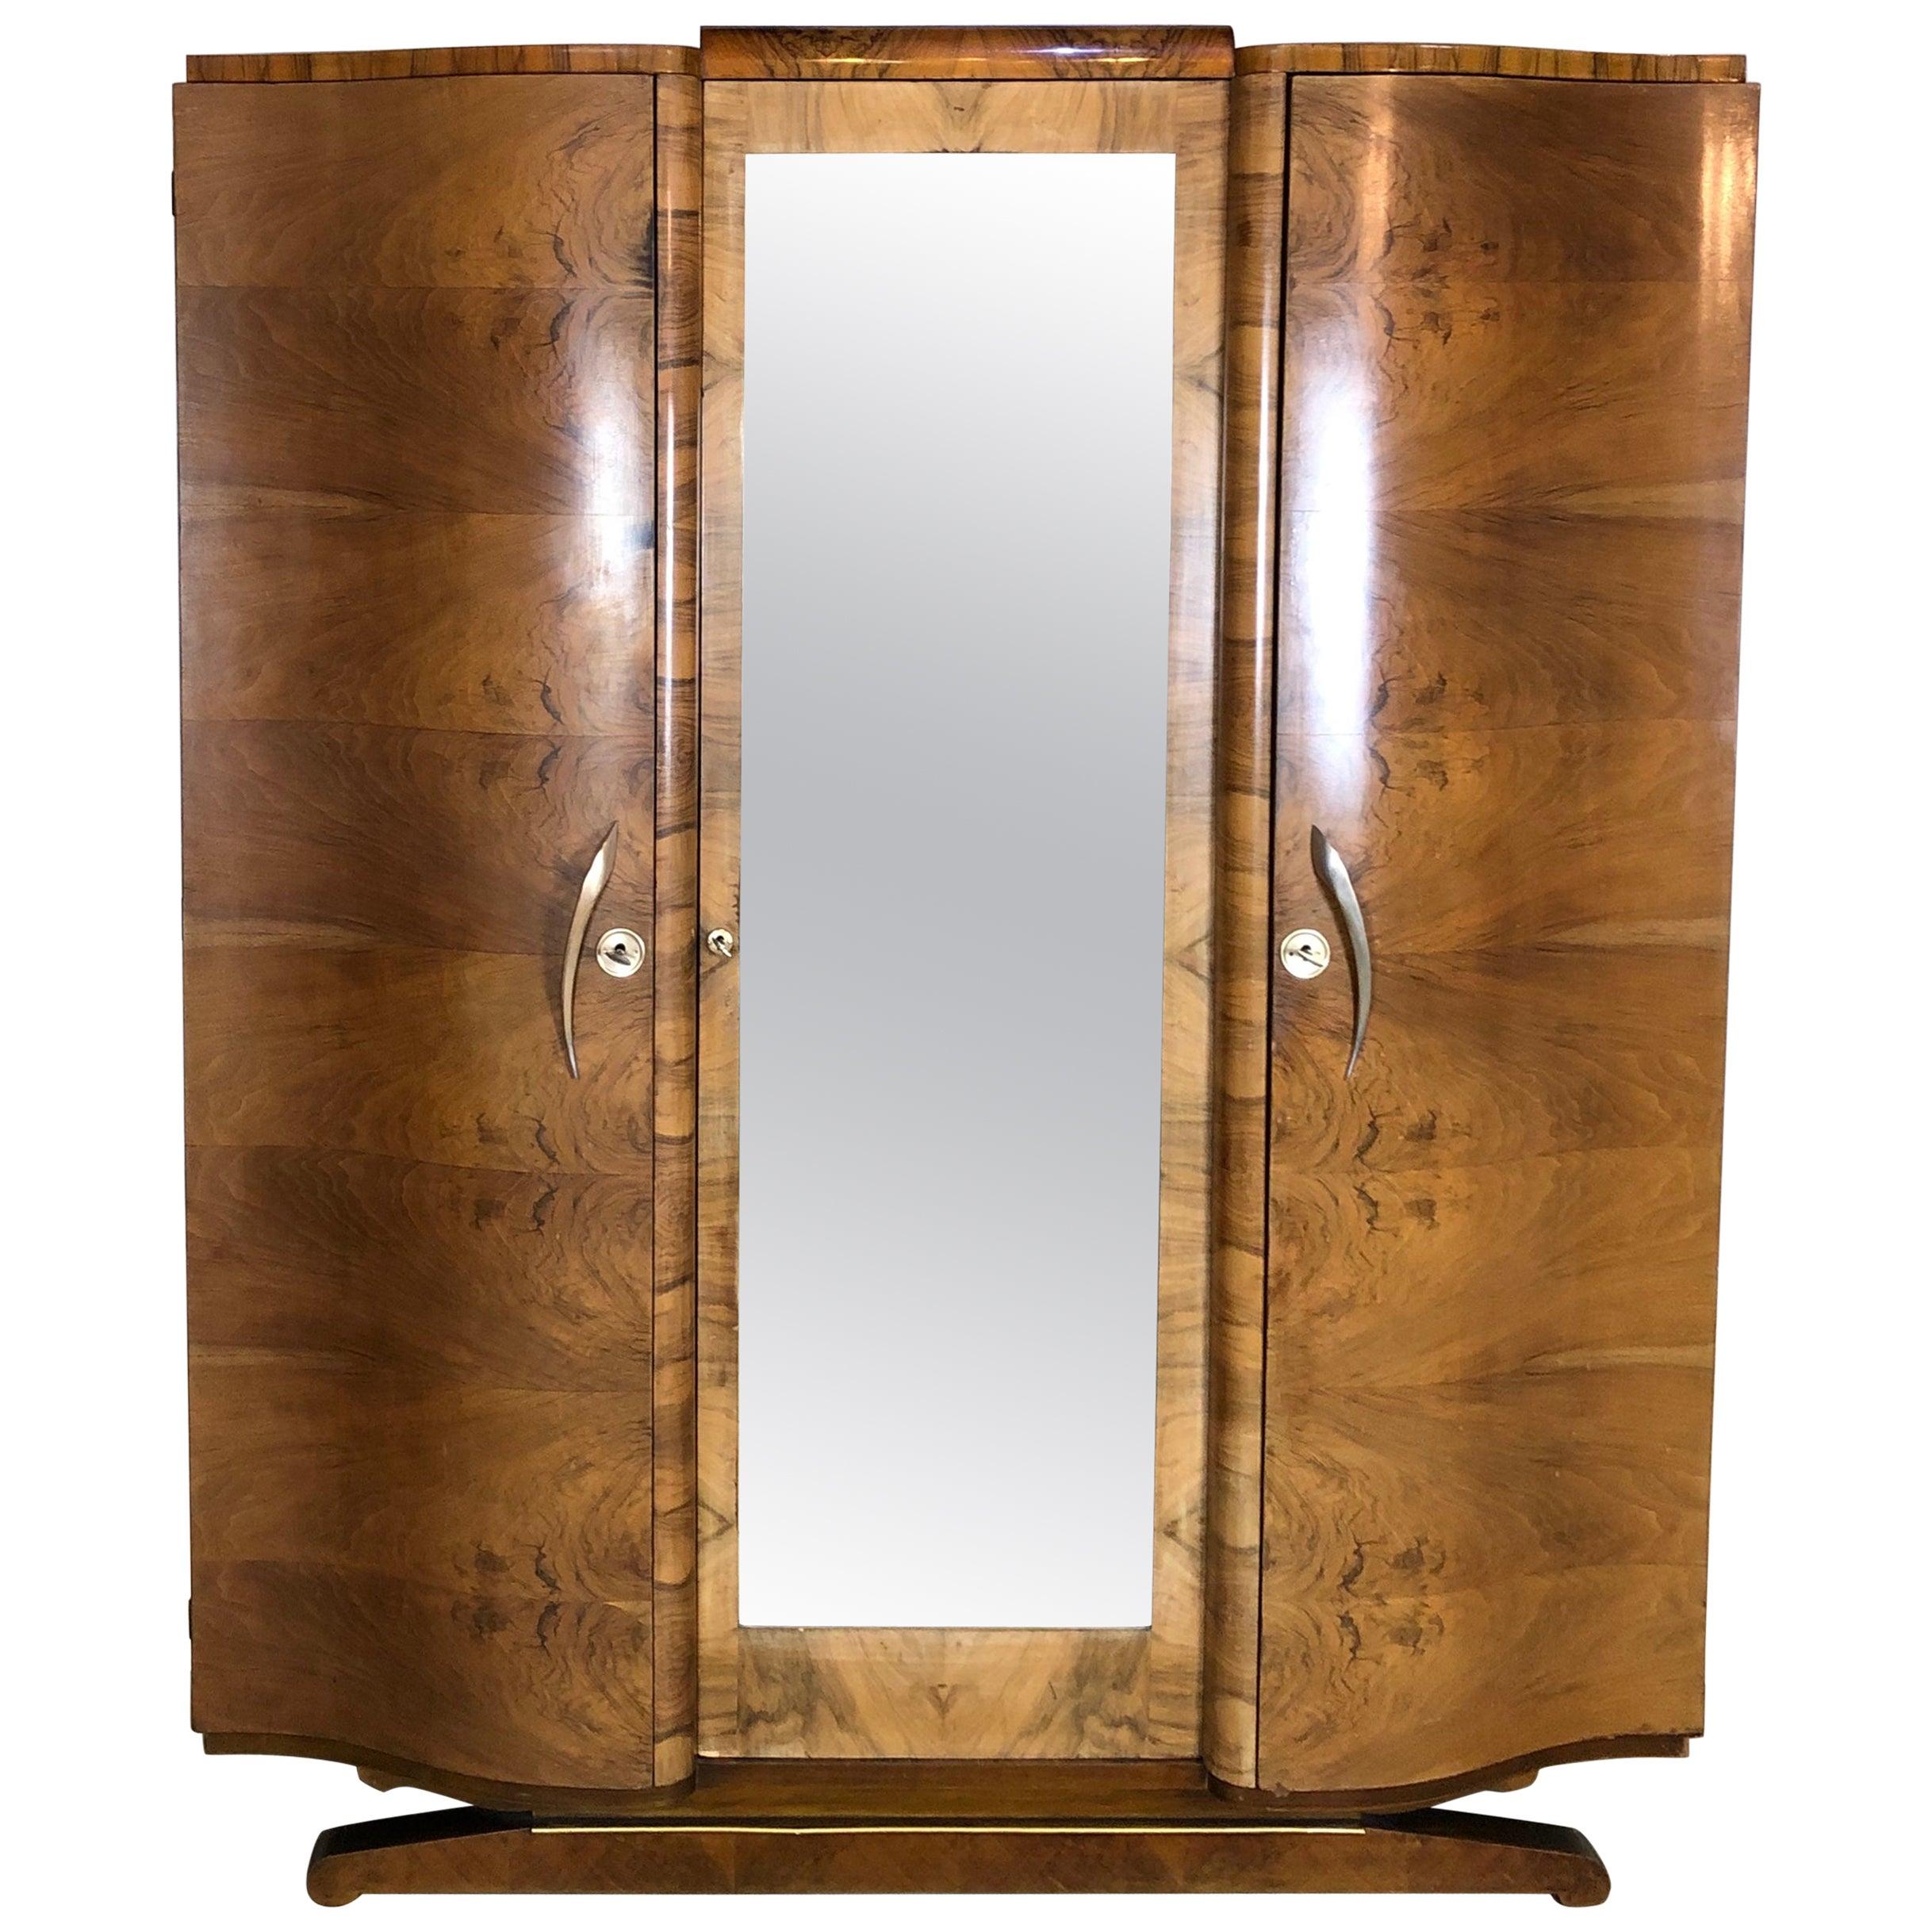 French Art Deco Armoire or Wardrobe